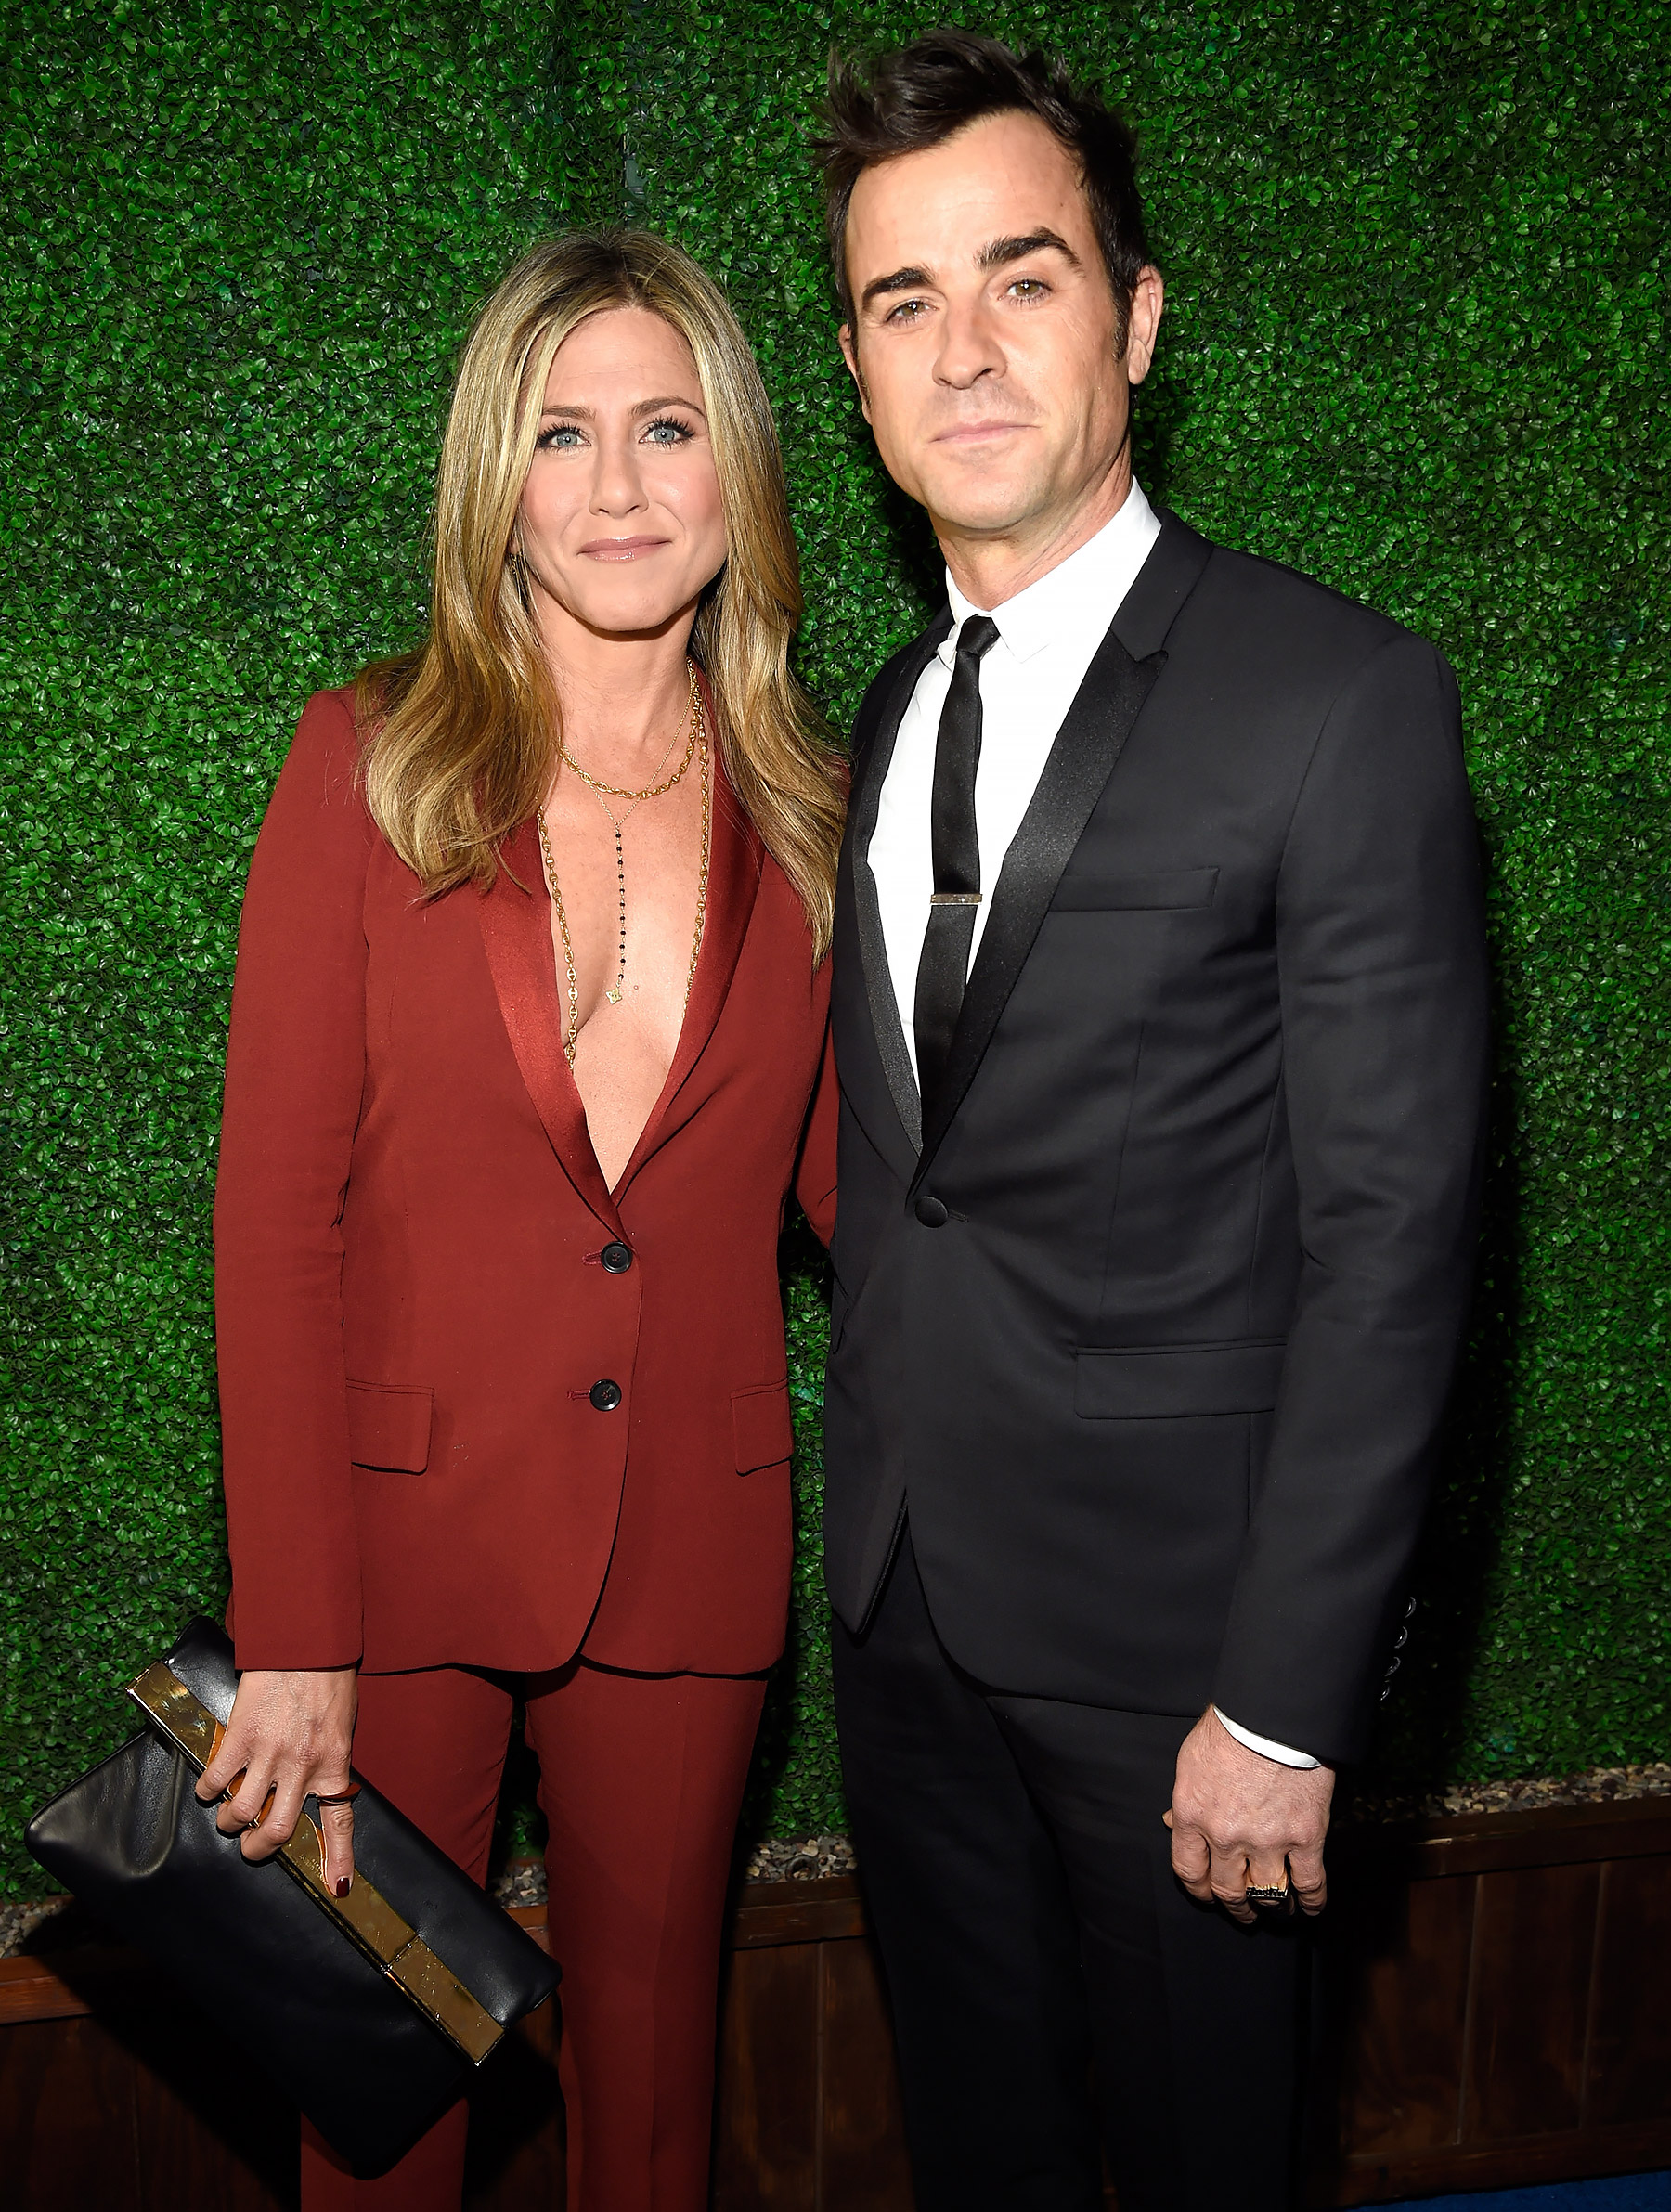 Jennifer y Justin